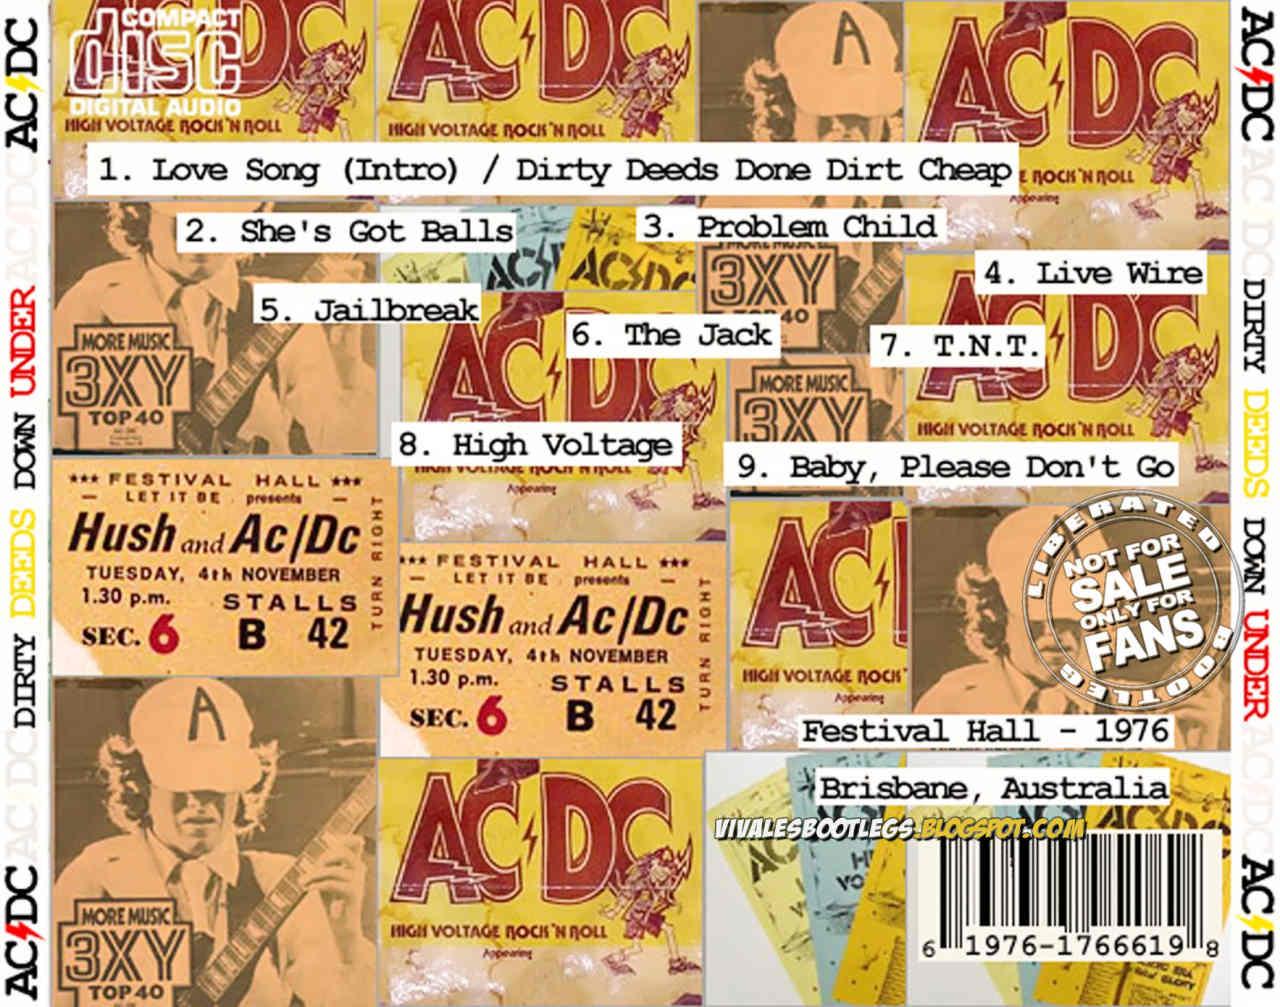 6a25aa82c1 AC/DC: Dirty Deeds Down Under. Festival Hall, Brisbane, Queensland,  Australia - December 18, 1976. (Mp3 @320 kbps & FLAC)